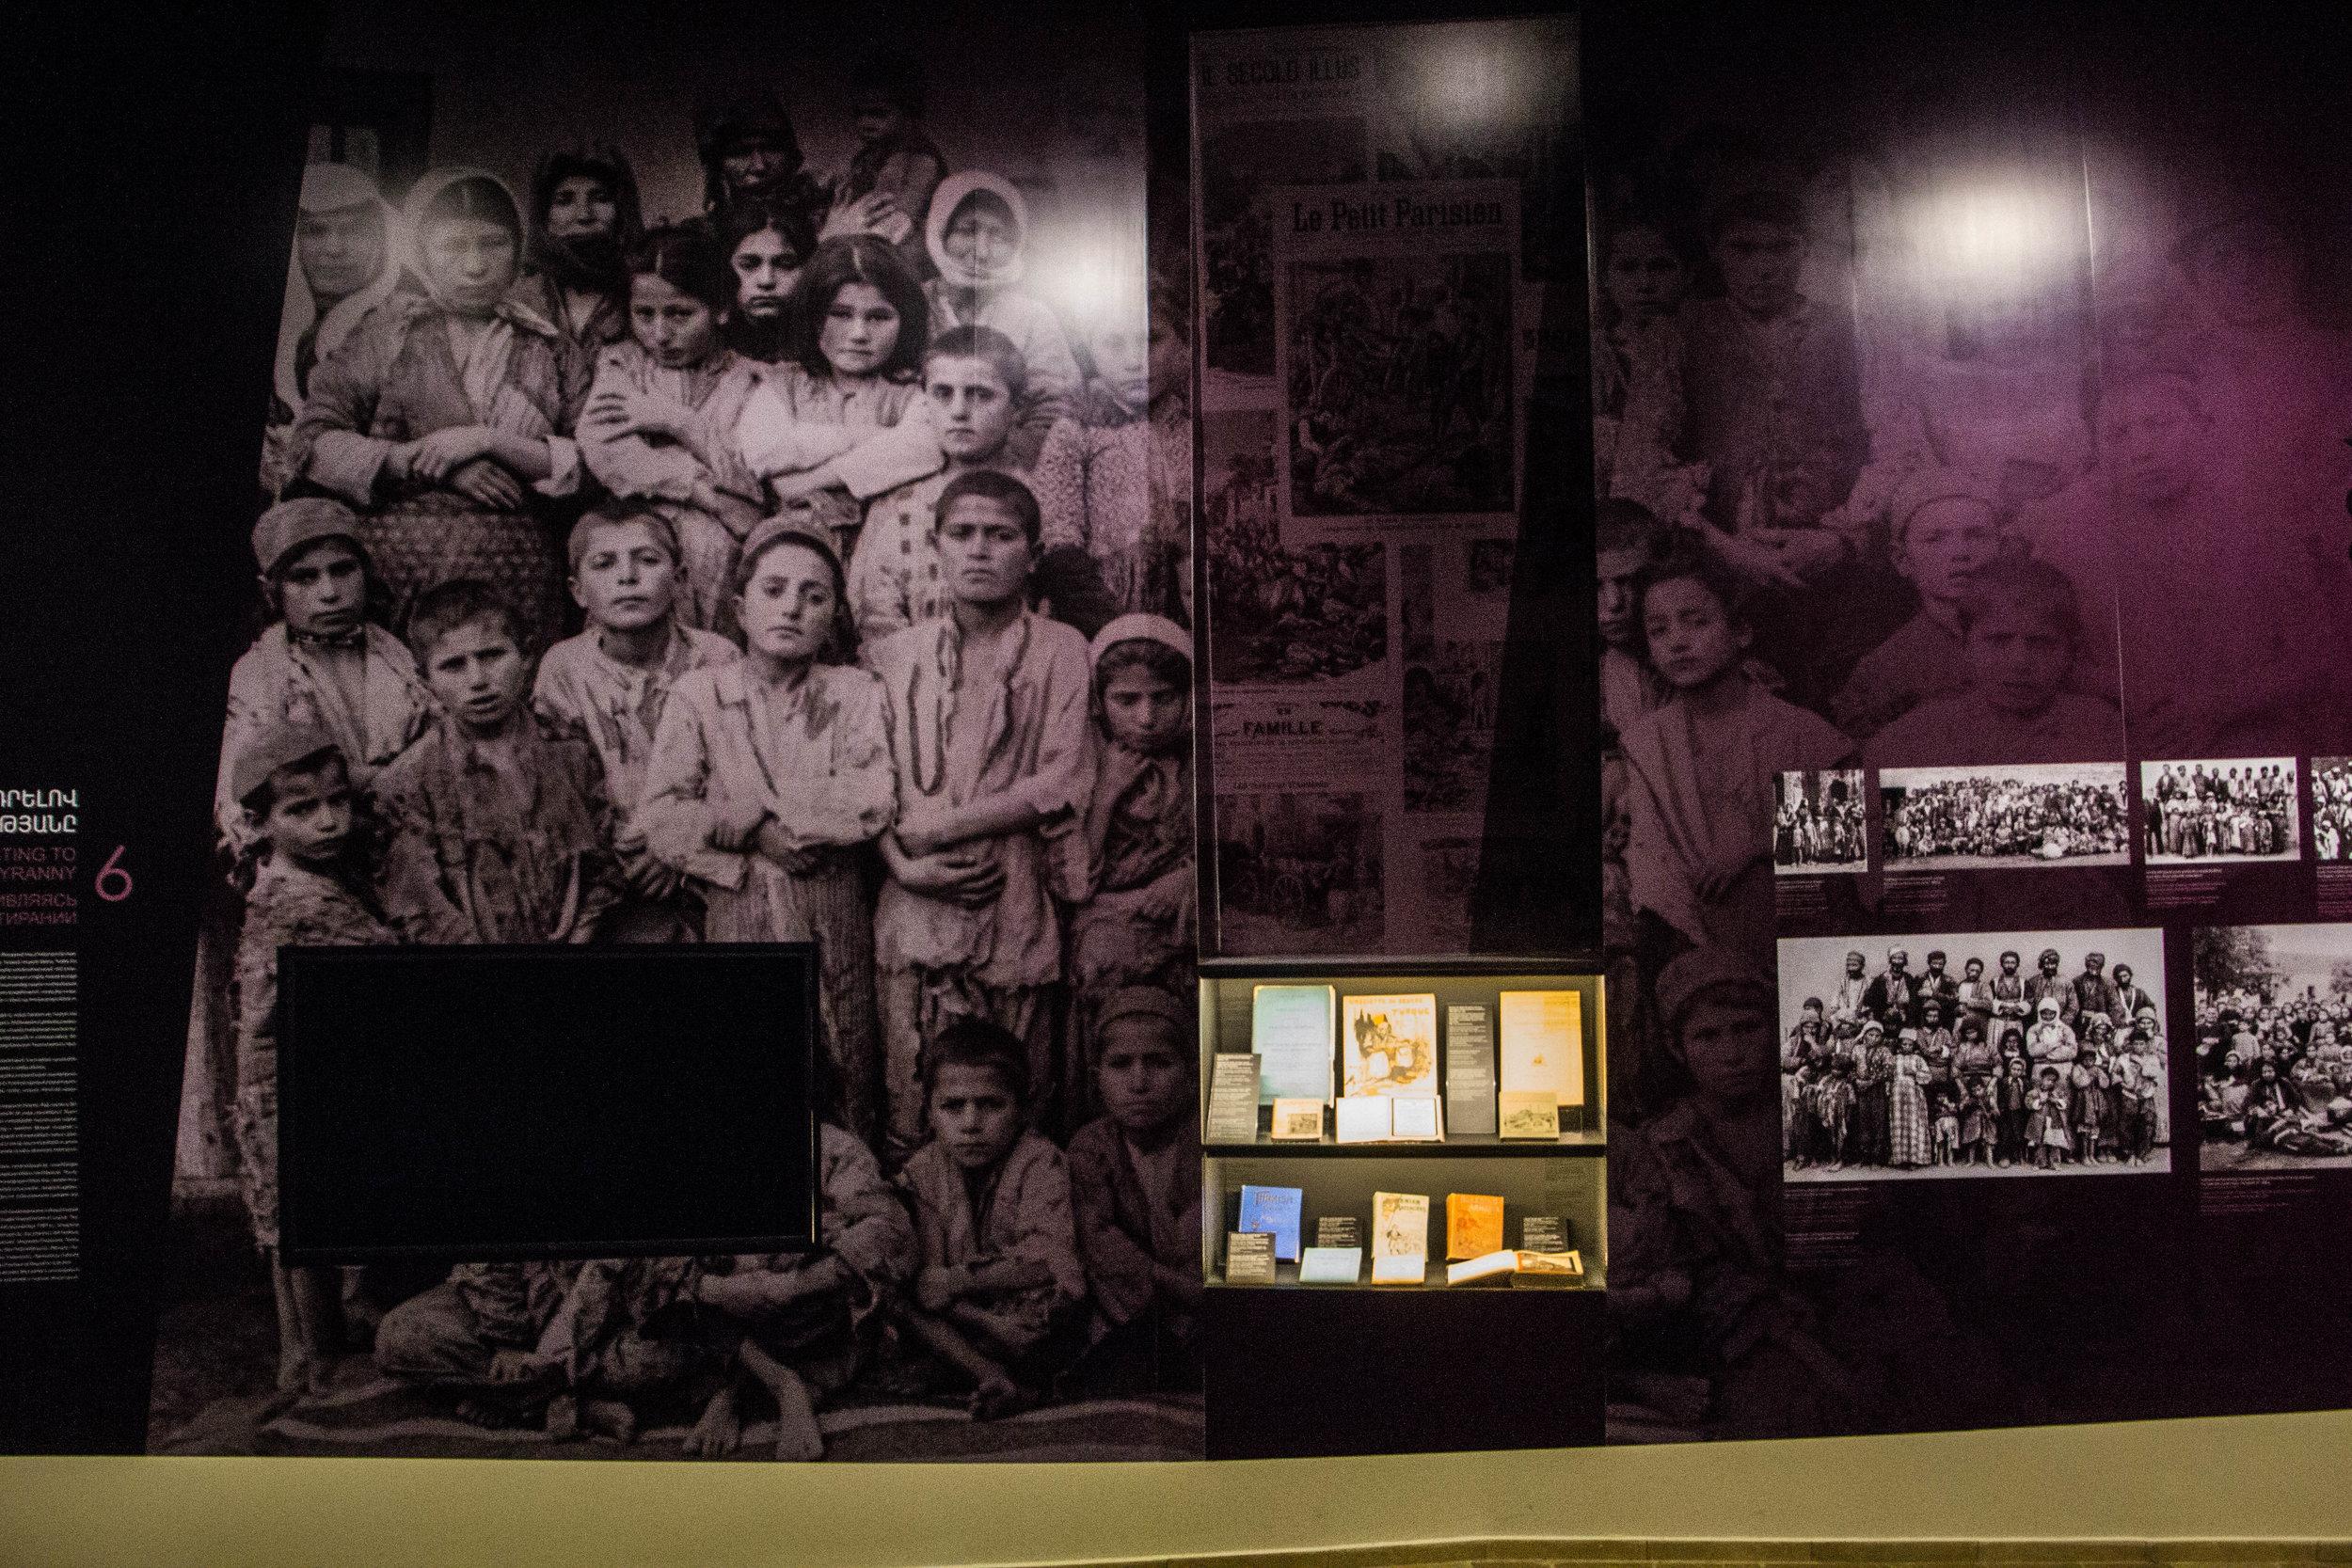 tsitsernakaberd-armenian-genocide-memorial-7.jpg